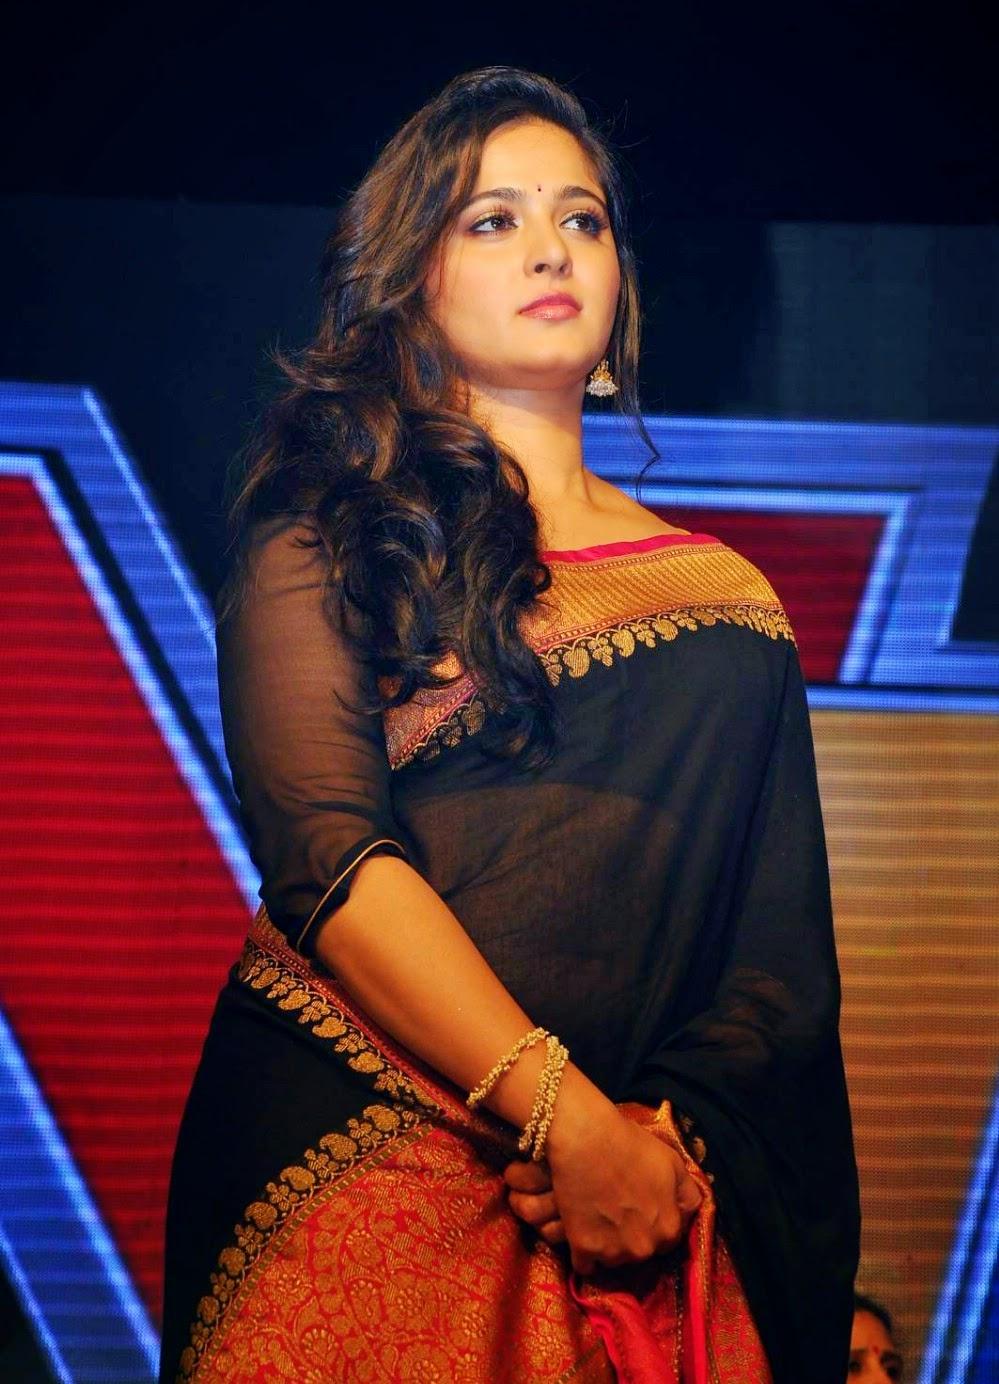 Anushka Shetty cure pics in sari